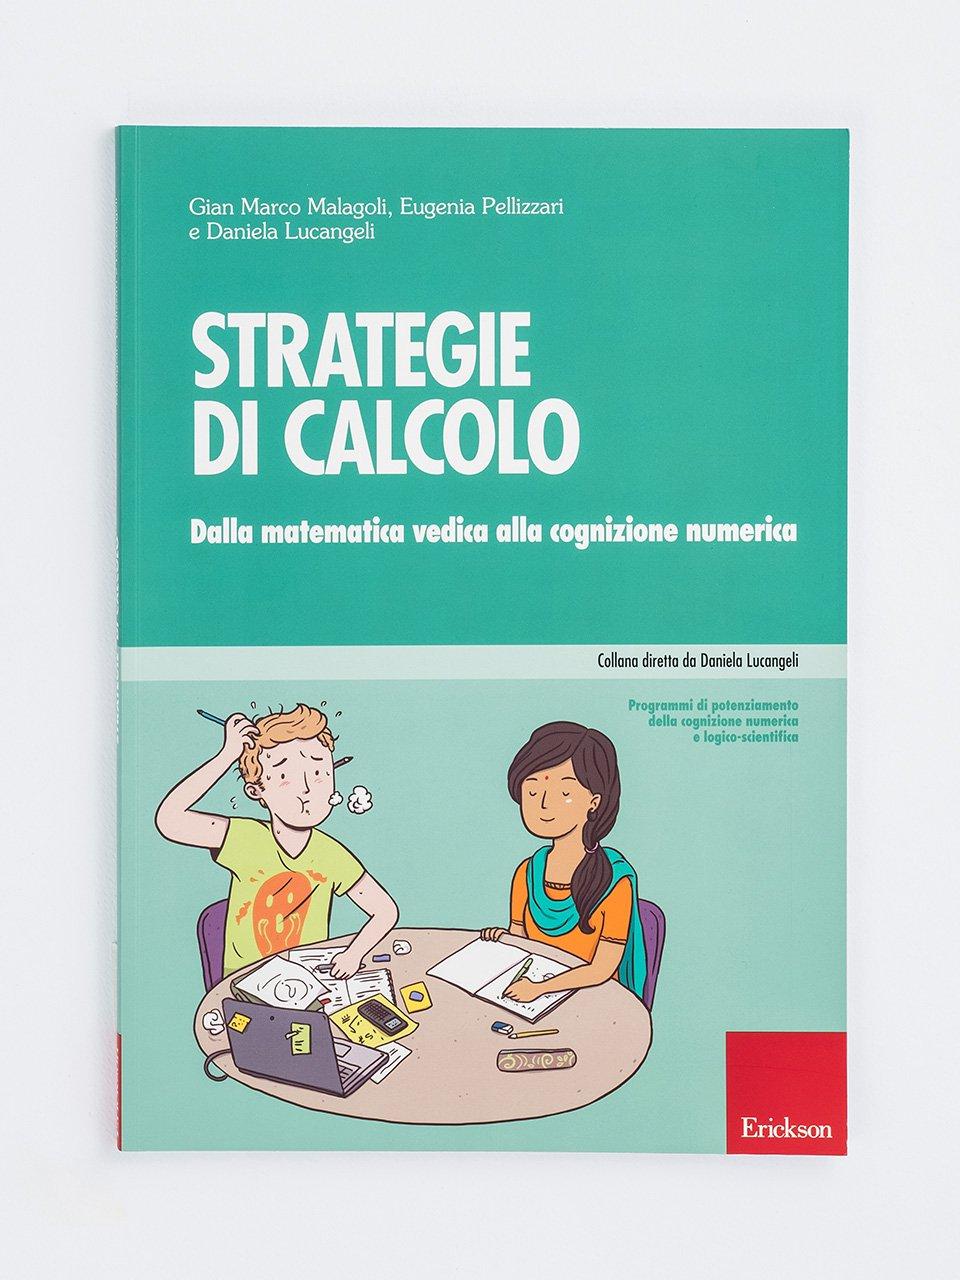 Strategie di calcolo - Daniela Lucangeli - Erickson